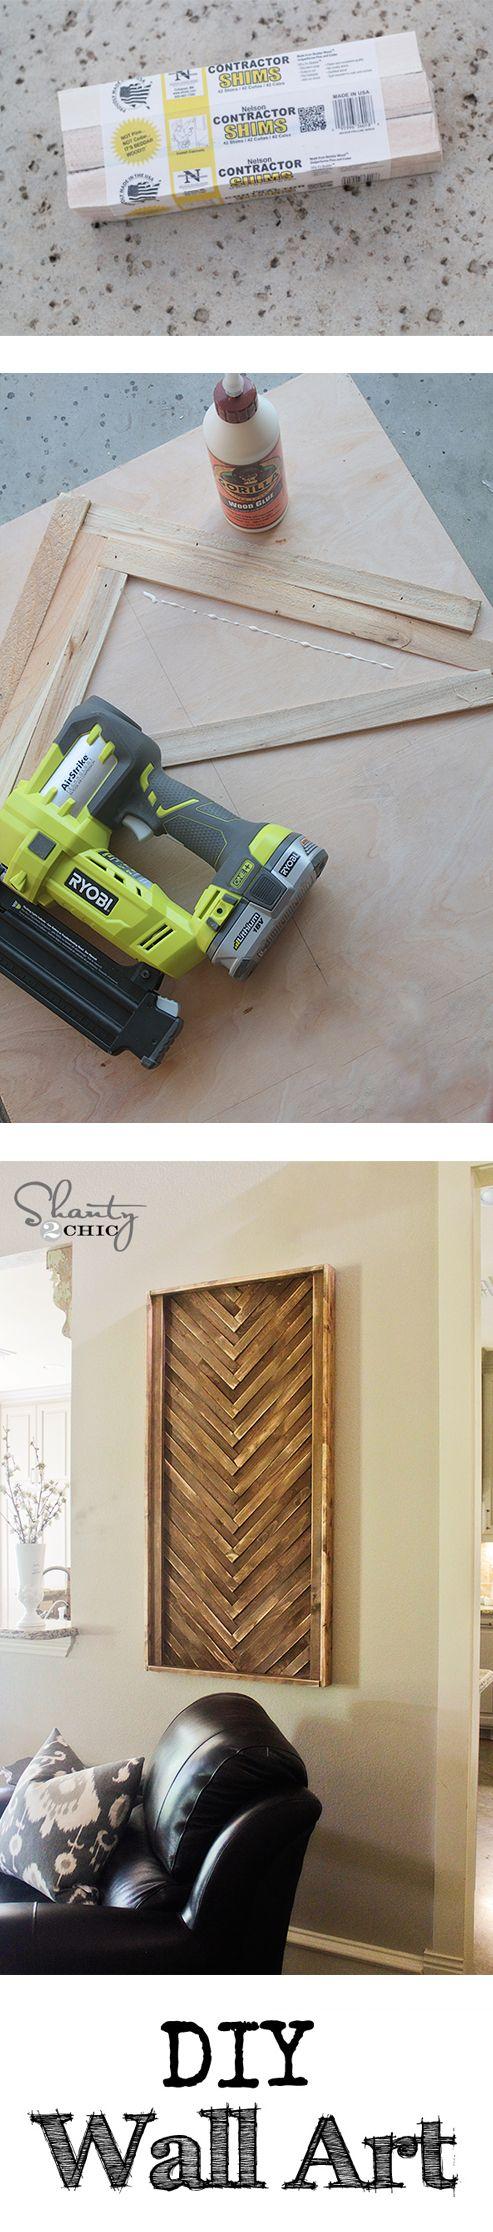 Photo of DIY Wall Art from Wood Shims!